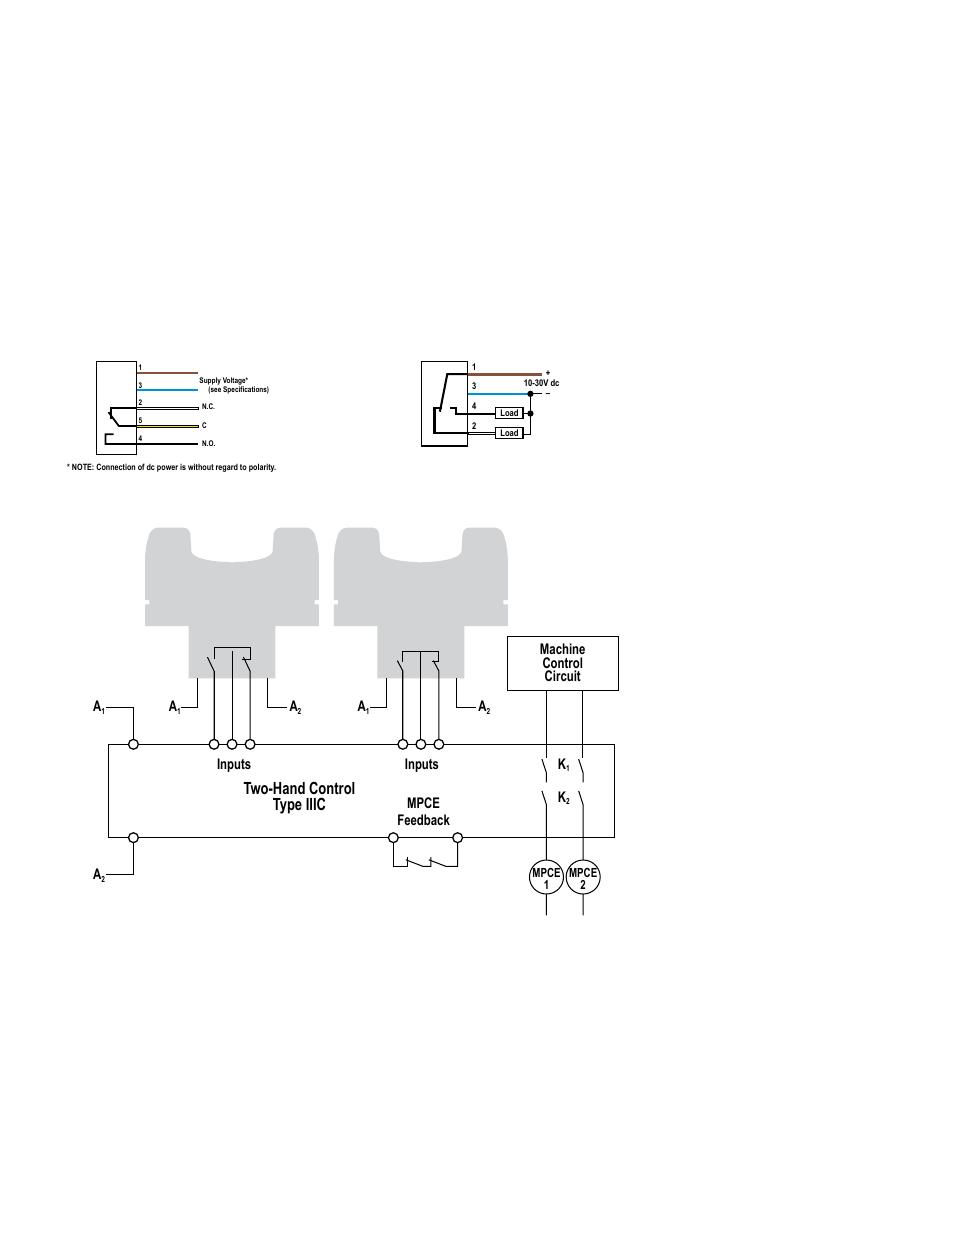 hookup diagrams two hand control type iiic banner duo touch run rh manualsdir com Control Wiring Diagram Symbols Fuel Pump Wiring Harness Diagram